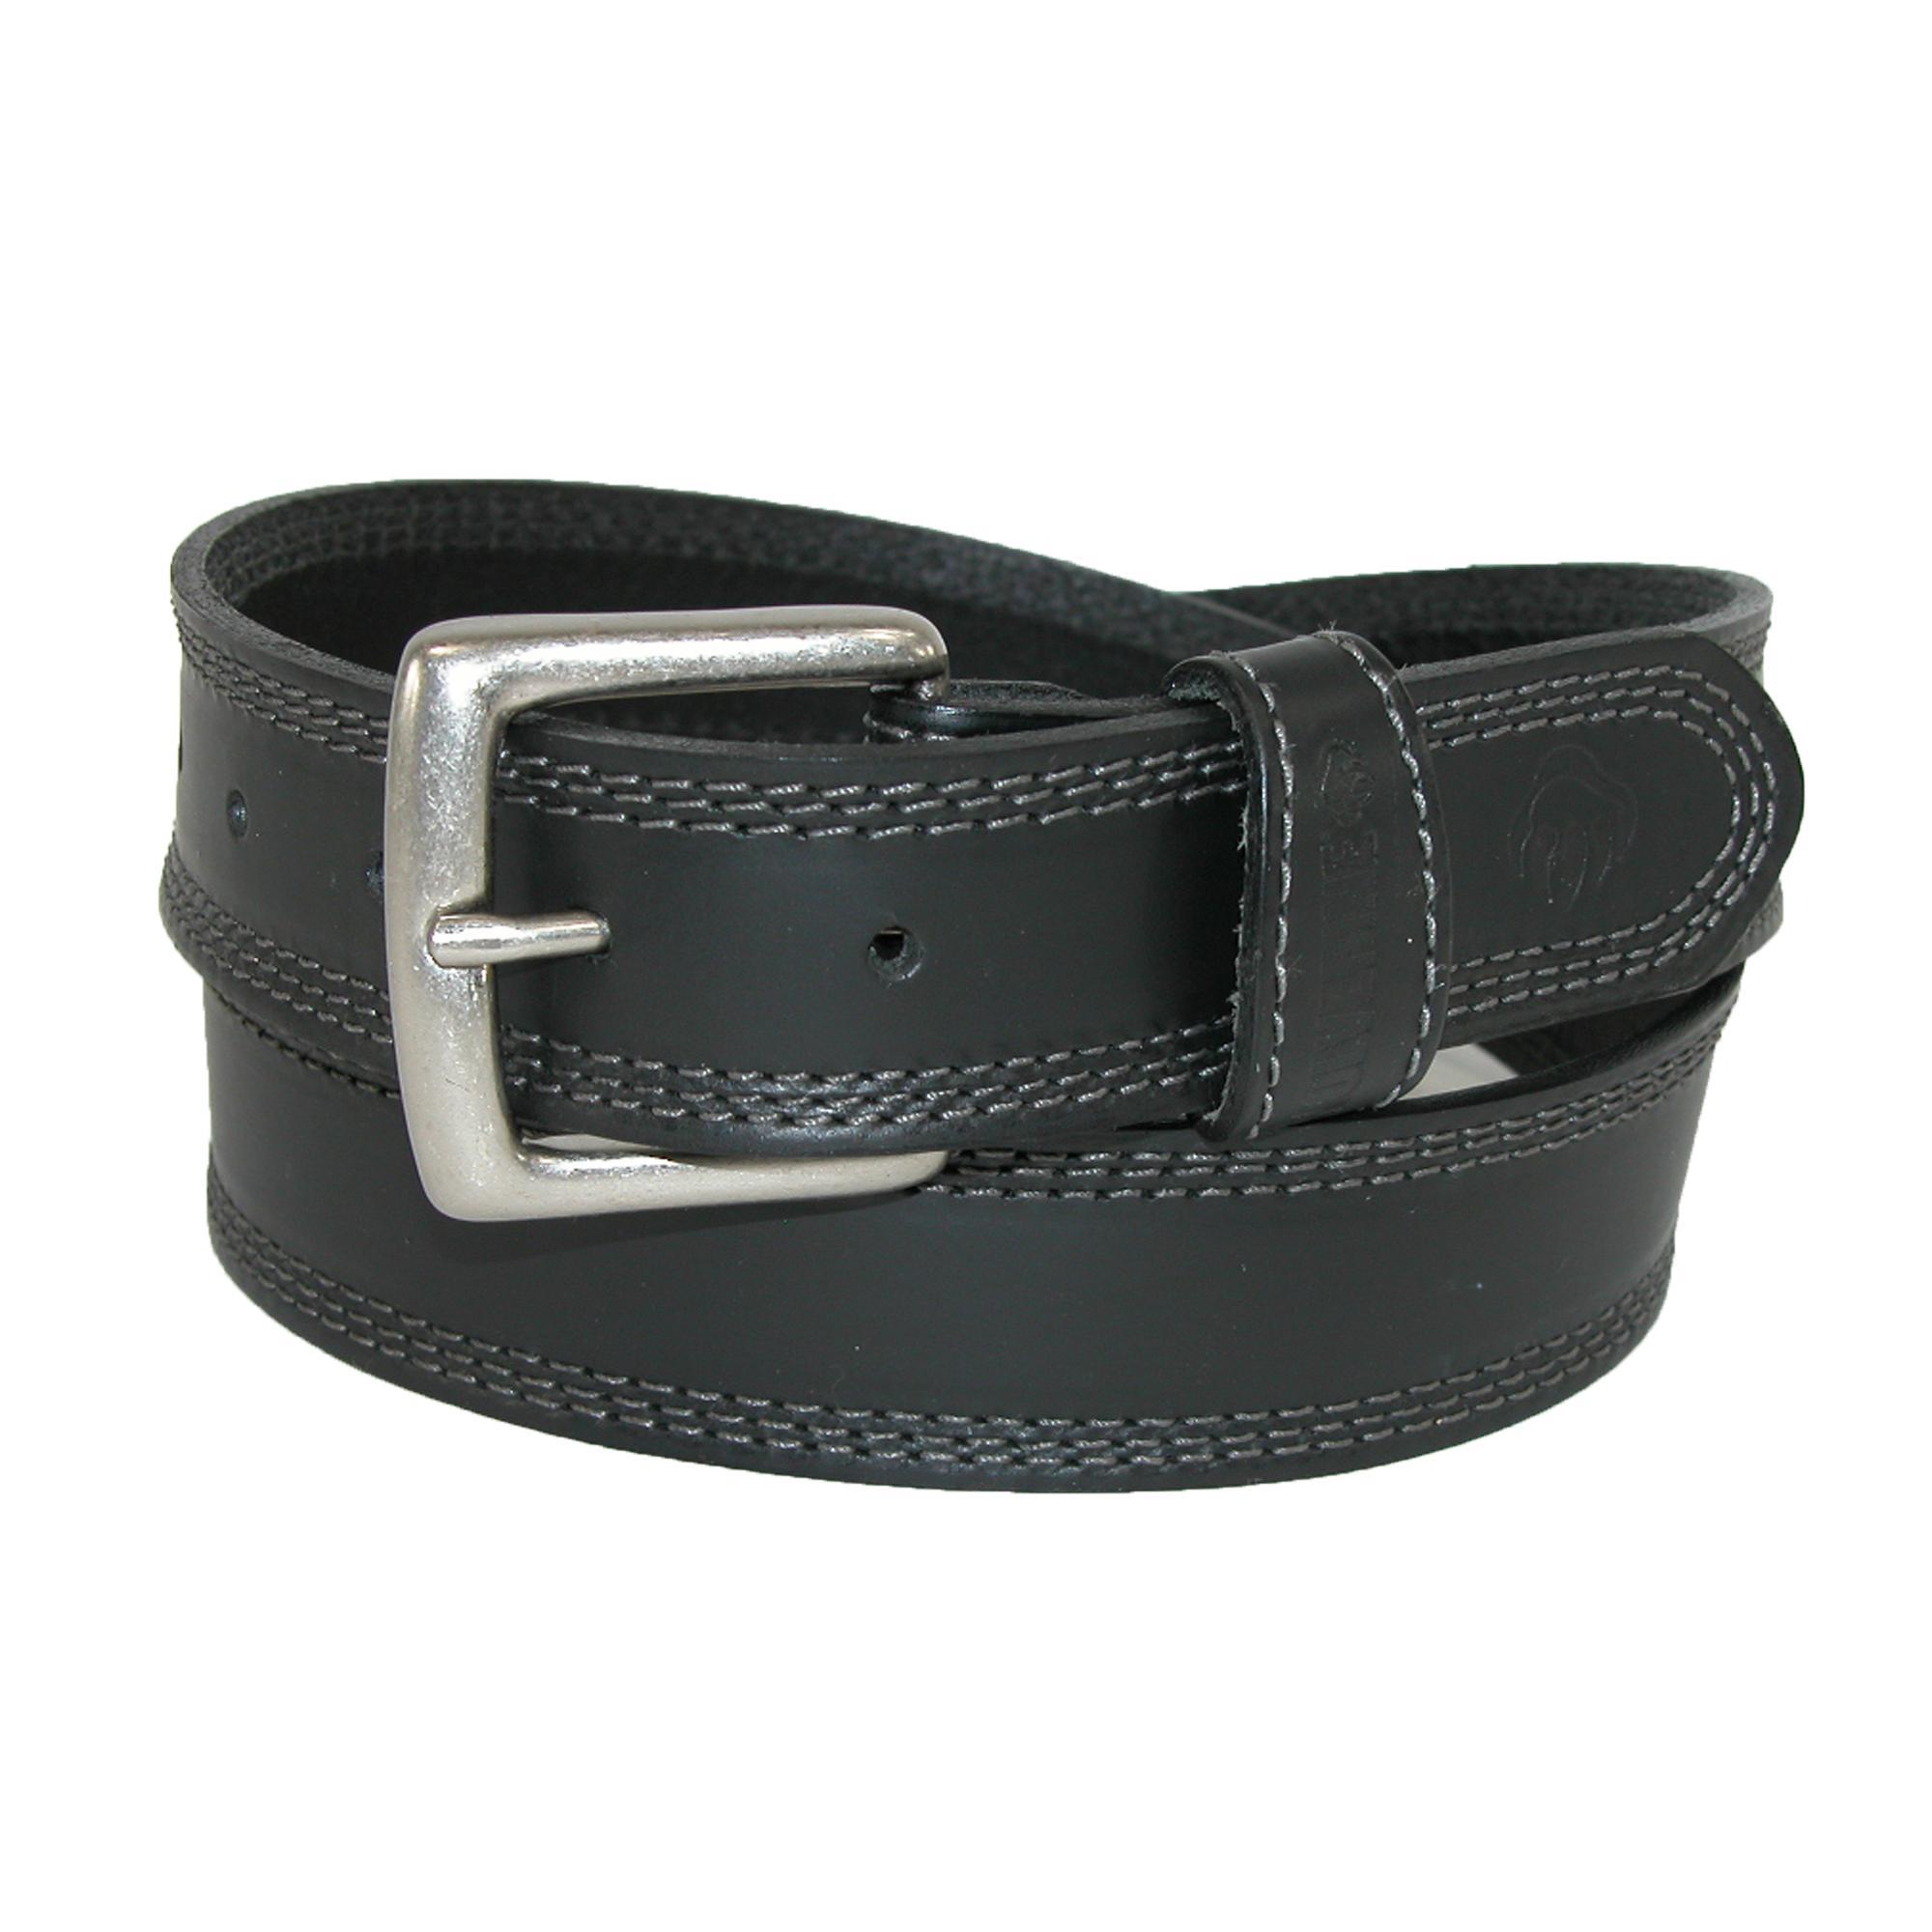 Wolverine Men's Leather 1 3/8 Inch Heavy Duty Bridle Belt